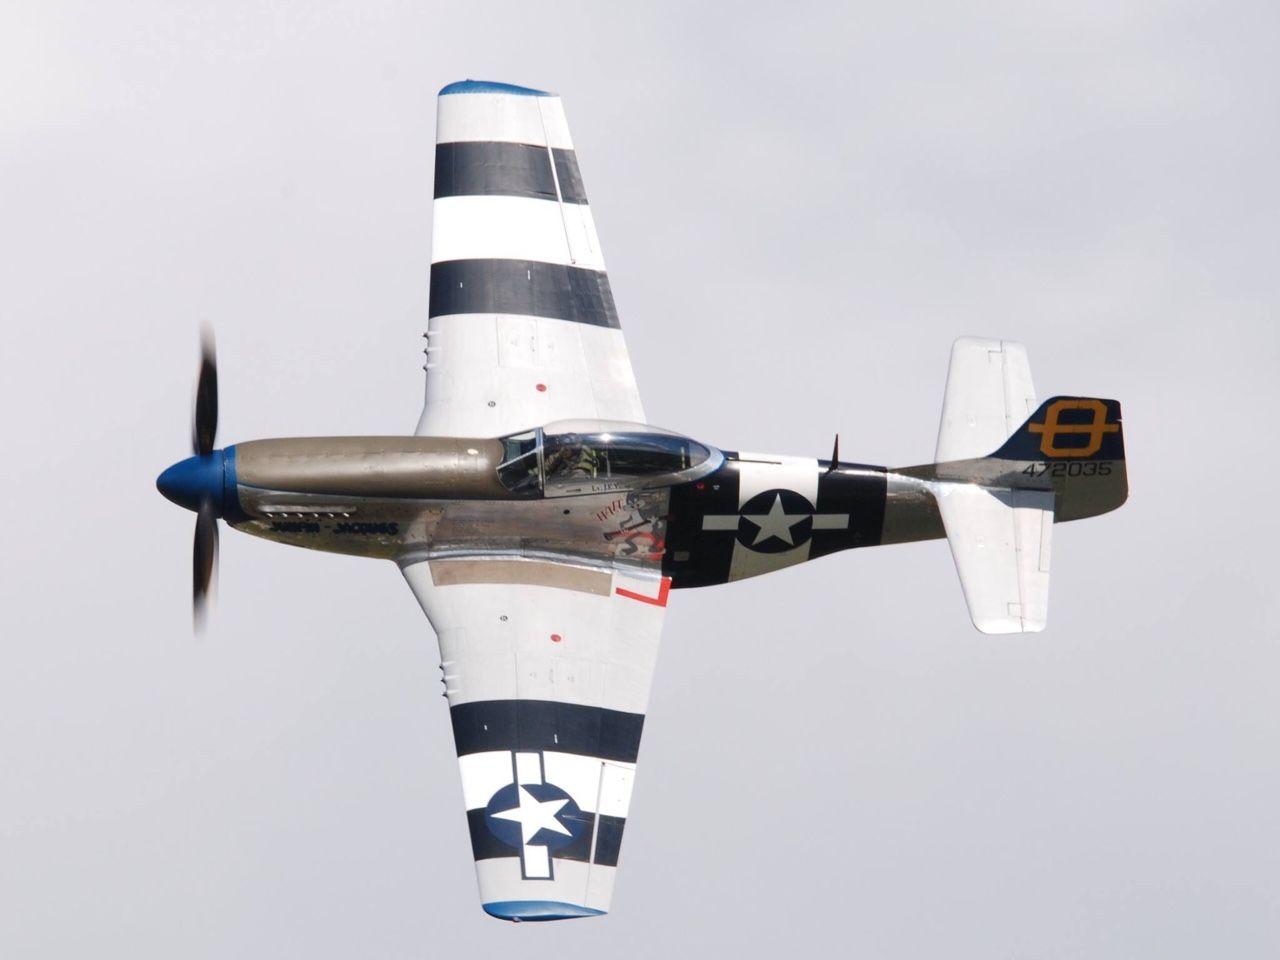 P-51 Mustang beautifulwarbirds@gmail.com Twitter: @thomasguettler Beautiful Warbirds Full Afterburner The Test Pilots P-38 Lightning Nasa History Science Fiction World Fantasy Literature & Art